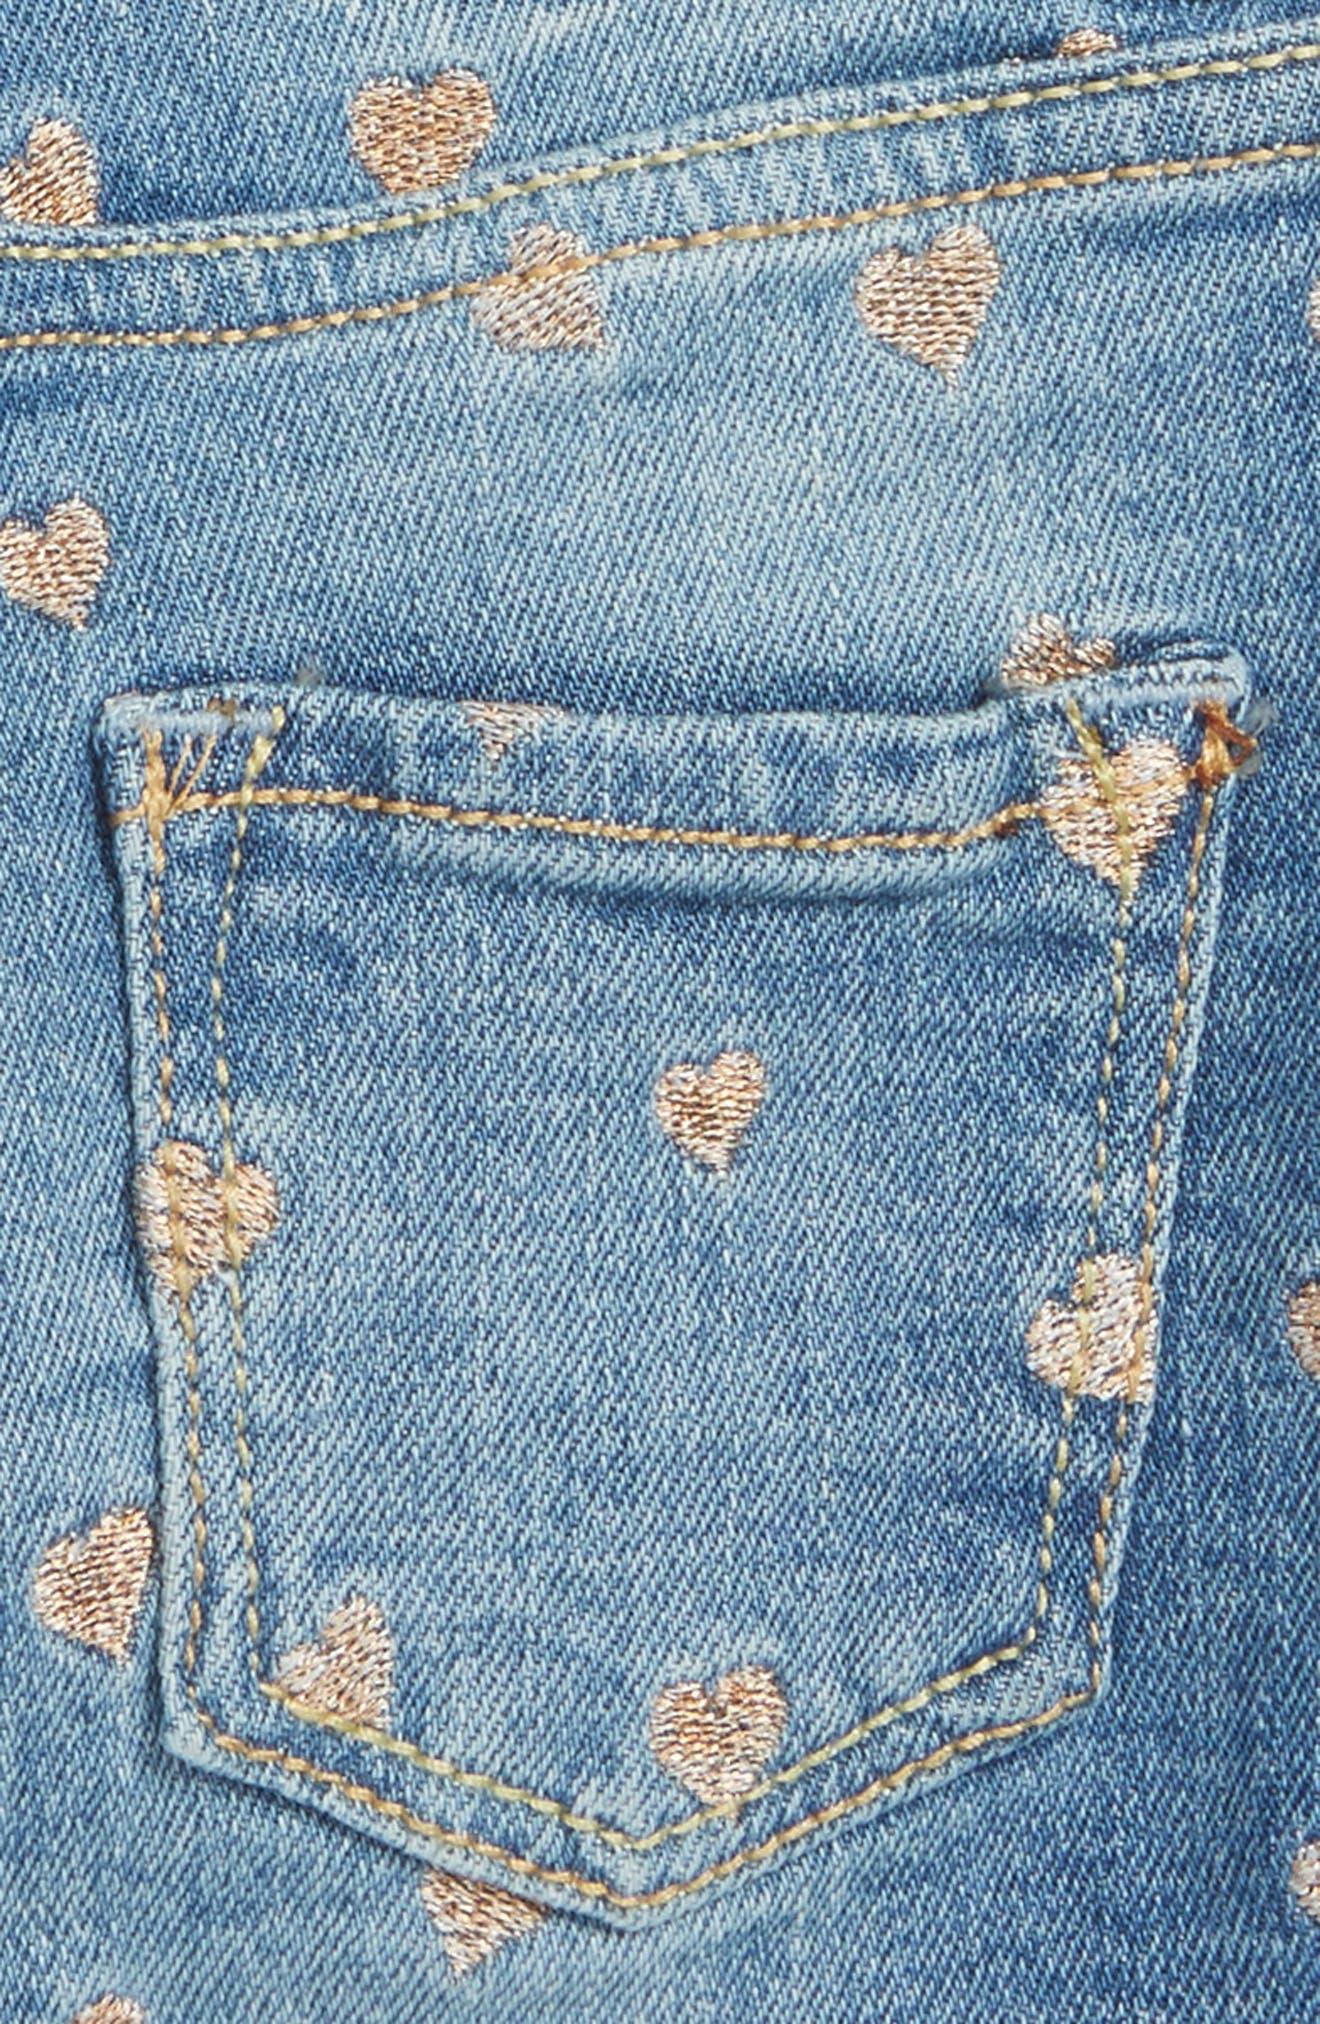 Mini Heart Cutoff Denim Shorts,                             Alternate thumbnail 3, color,                             Med Authentic